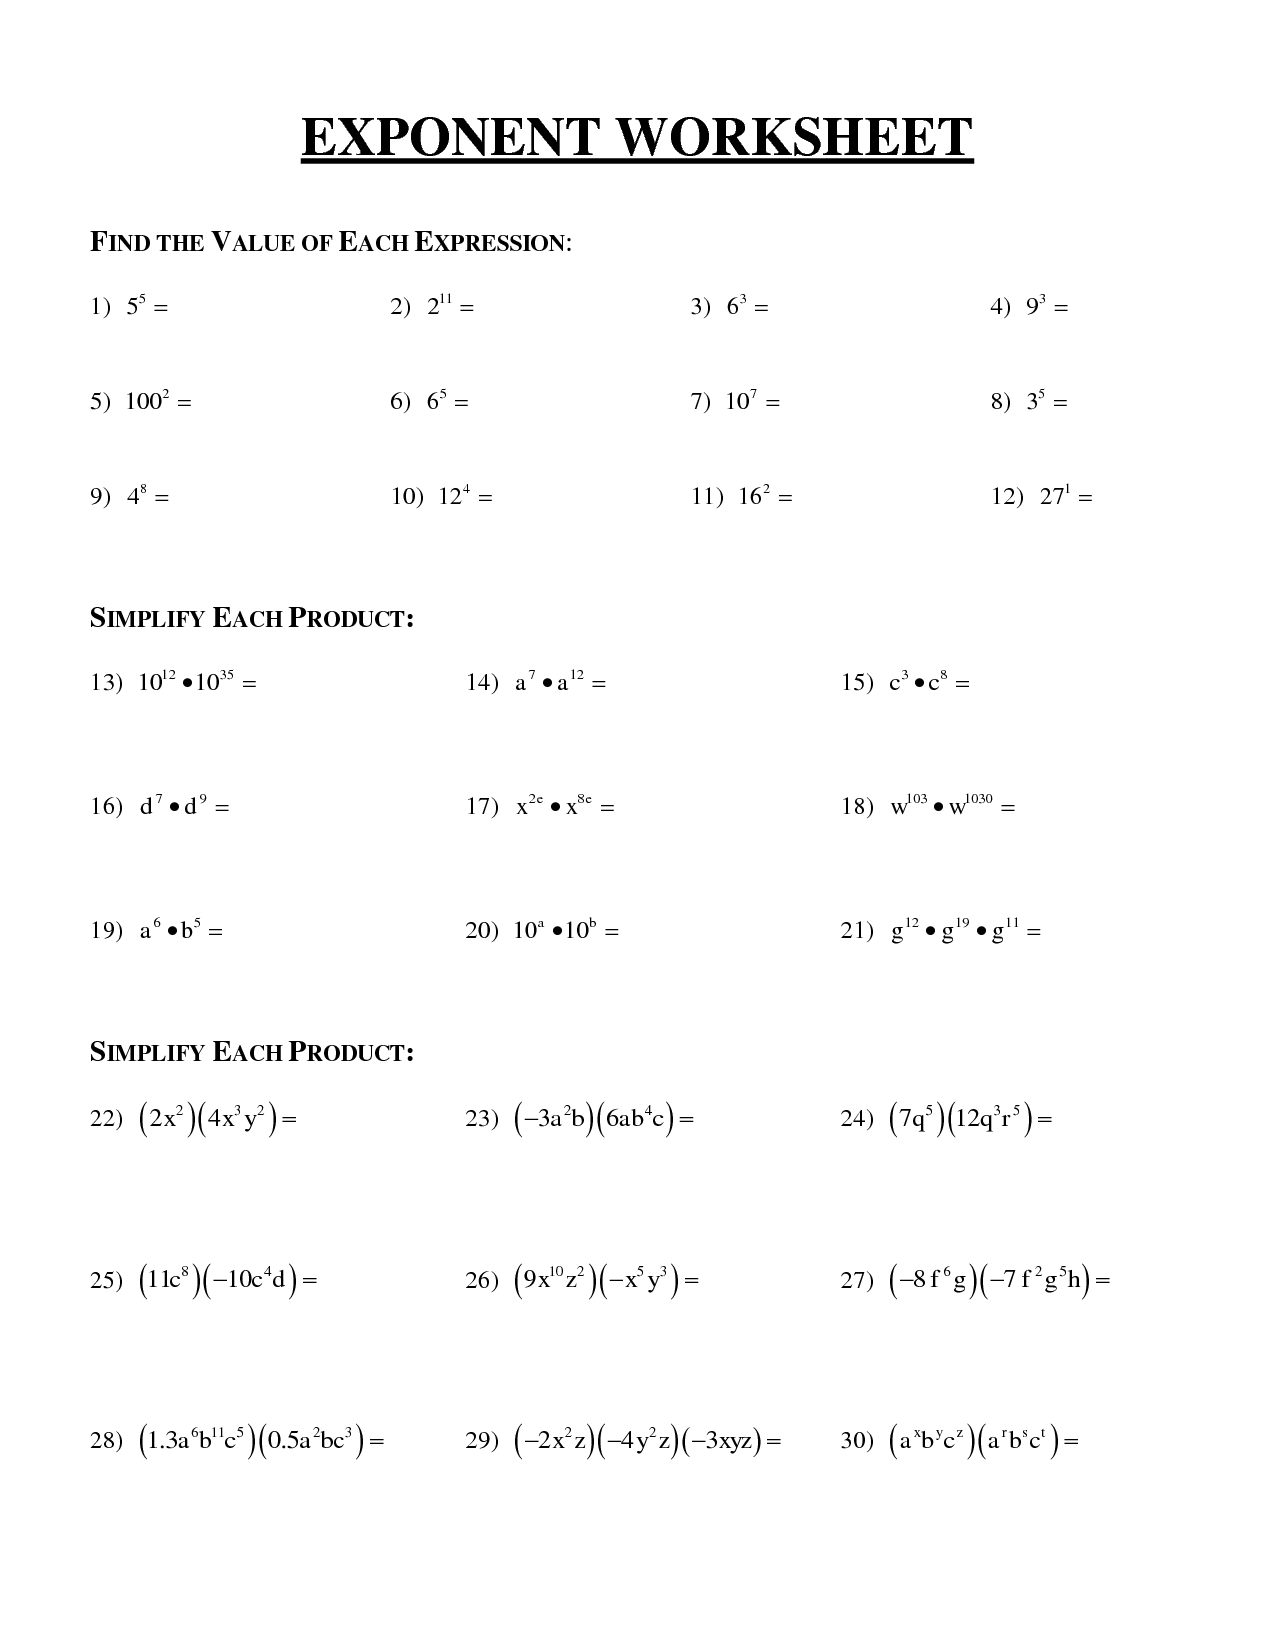 Evaluating Exponents Worksheet